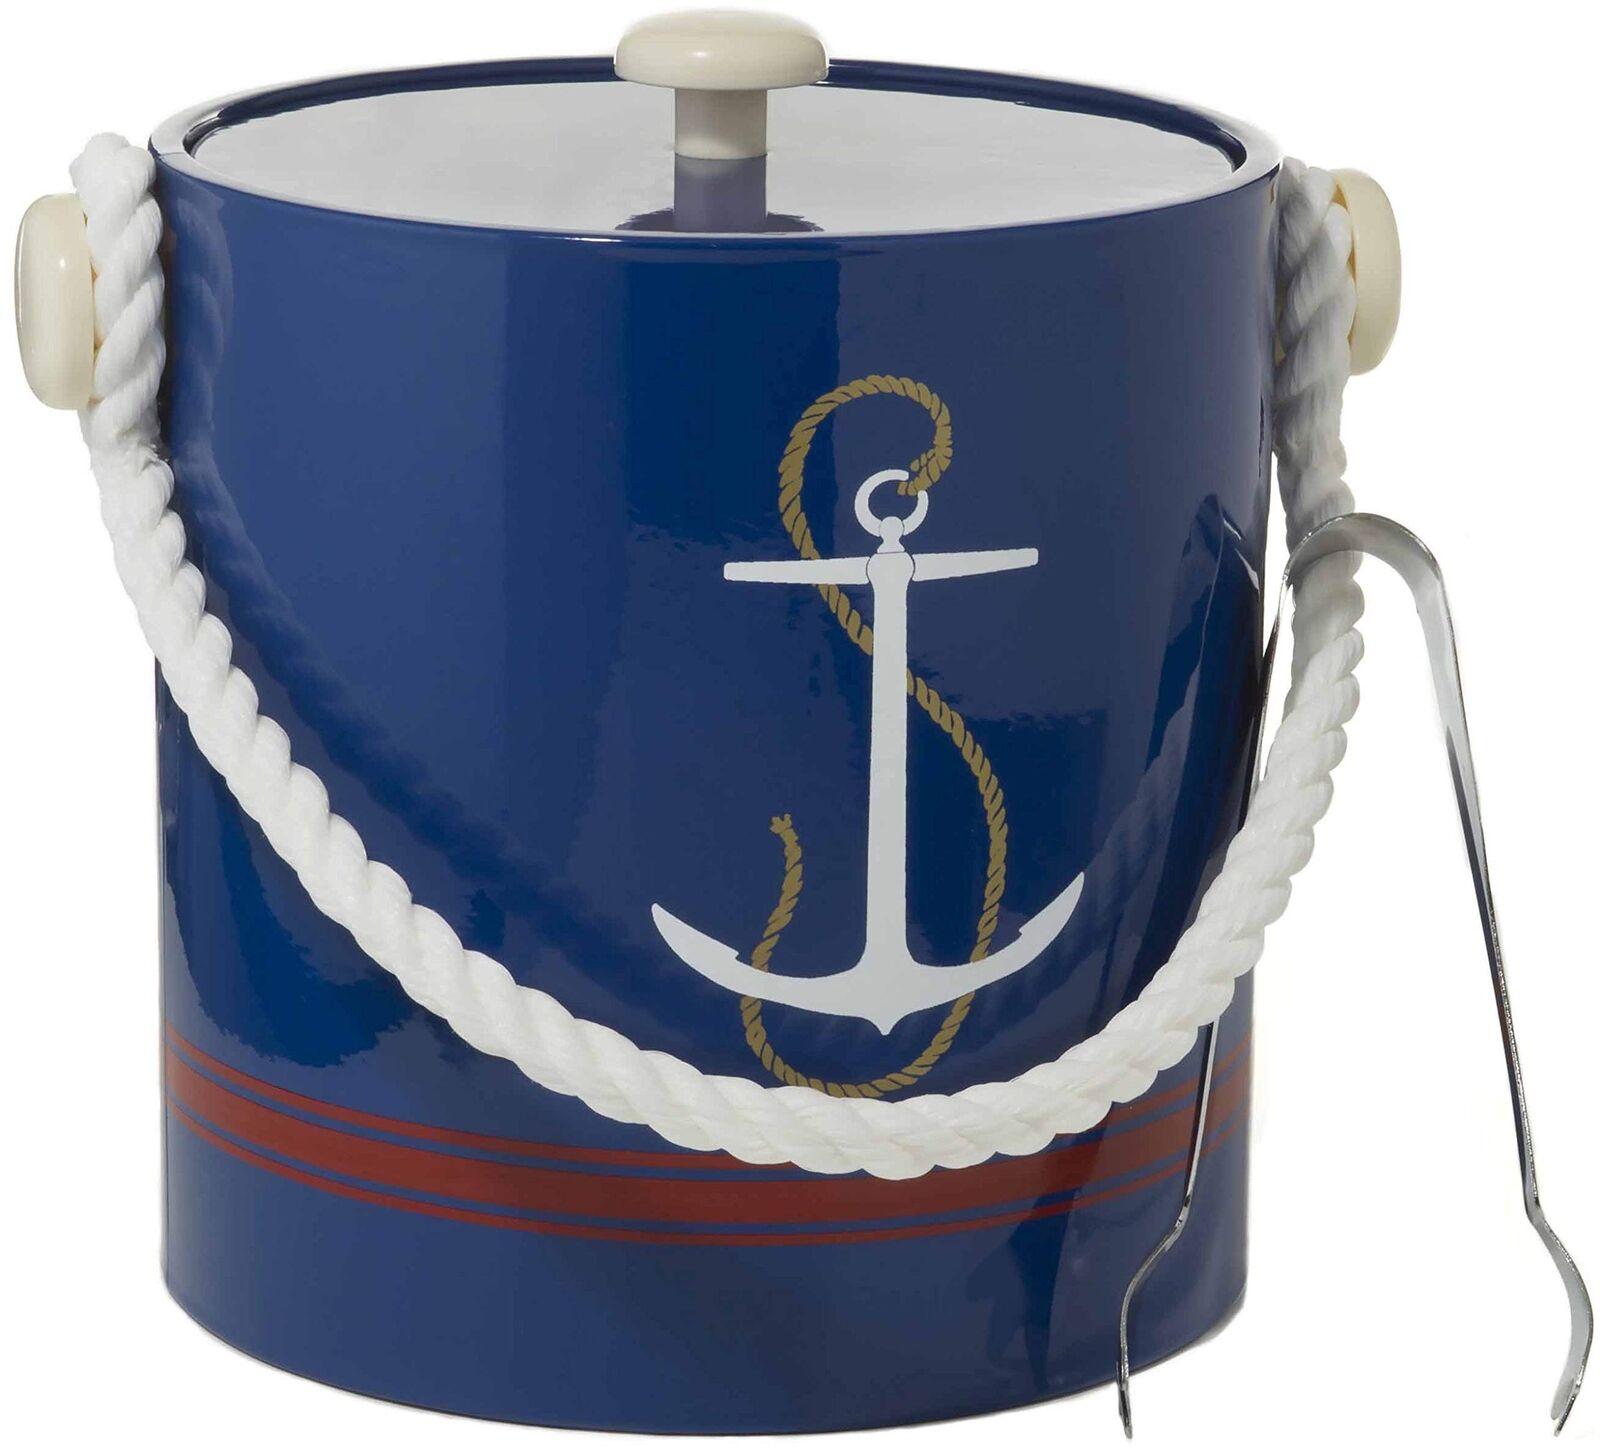 Hand Made in USA Bleu Marine Ancre avec corde poignée double paroi 3 Litre Seau à glace